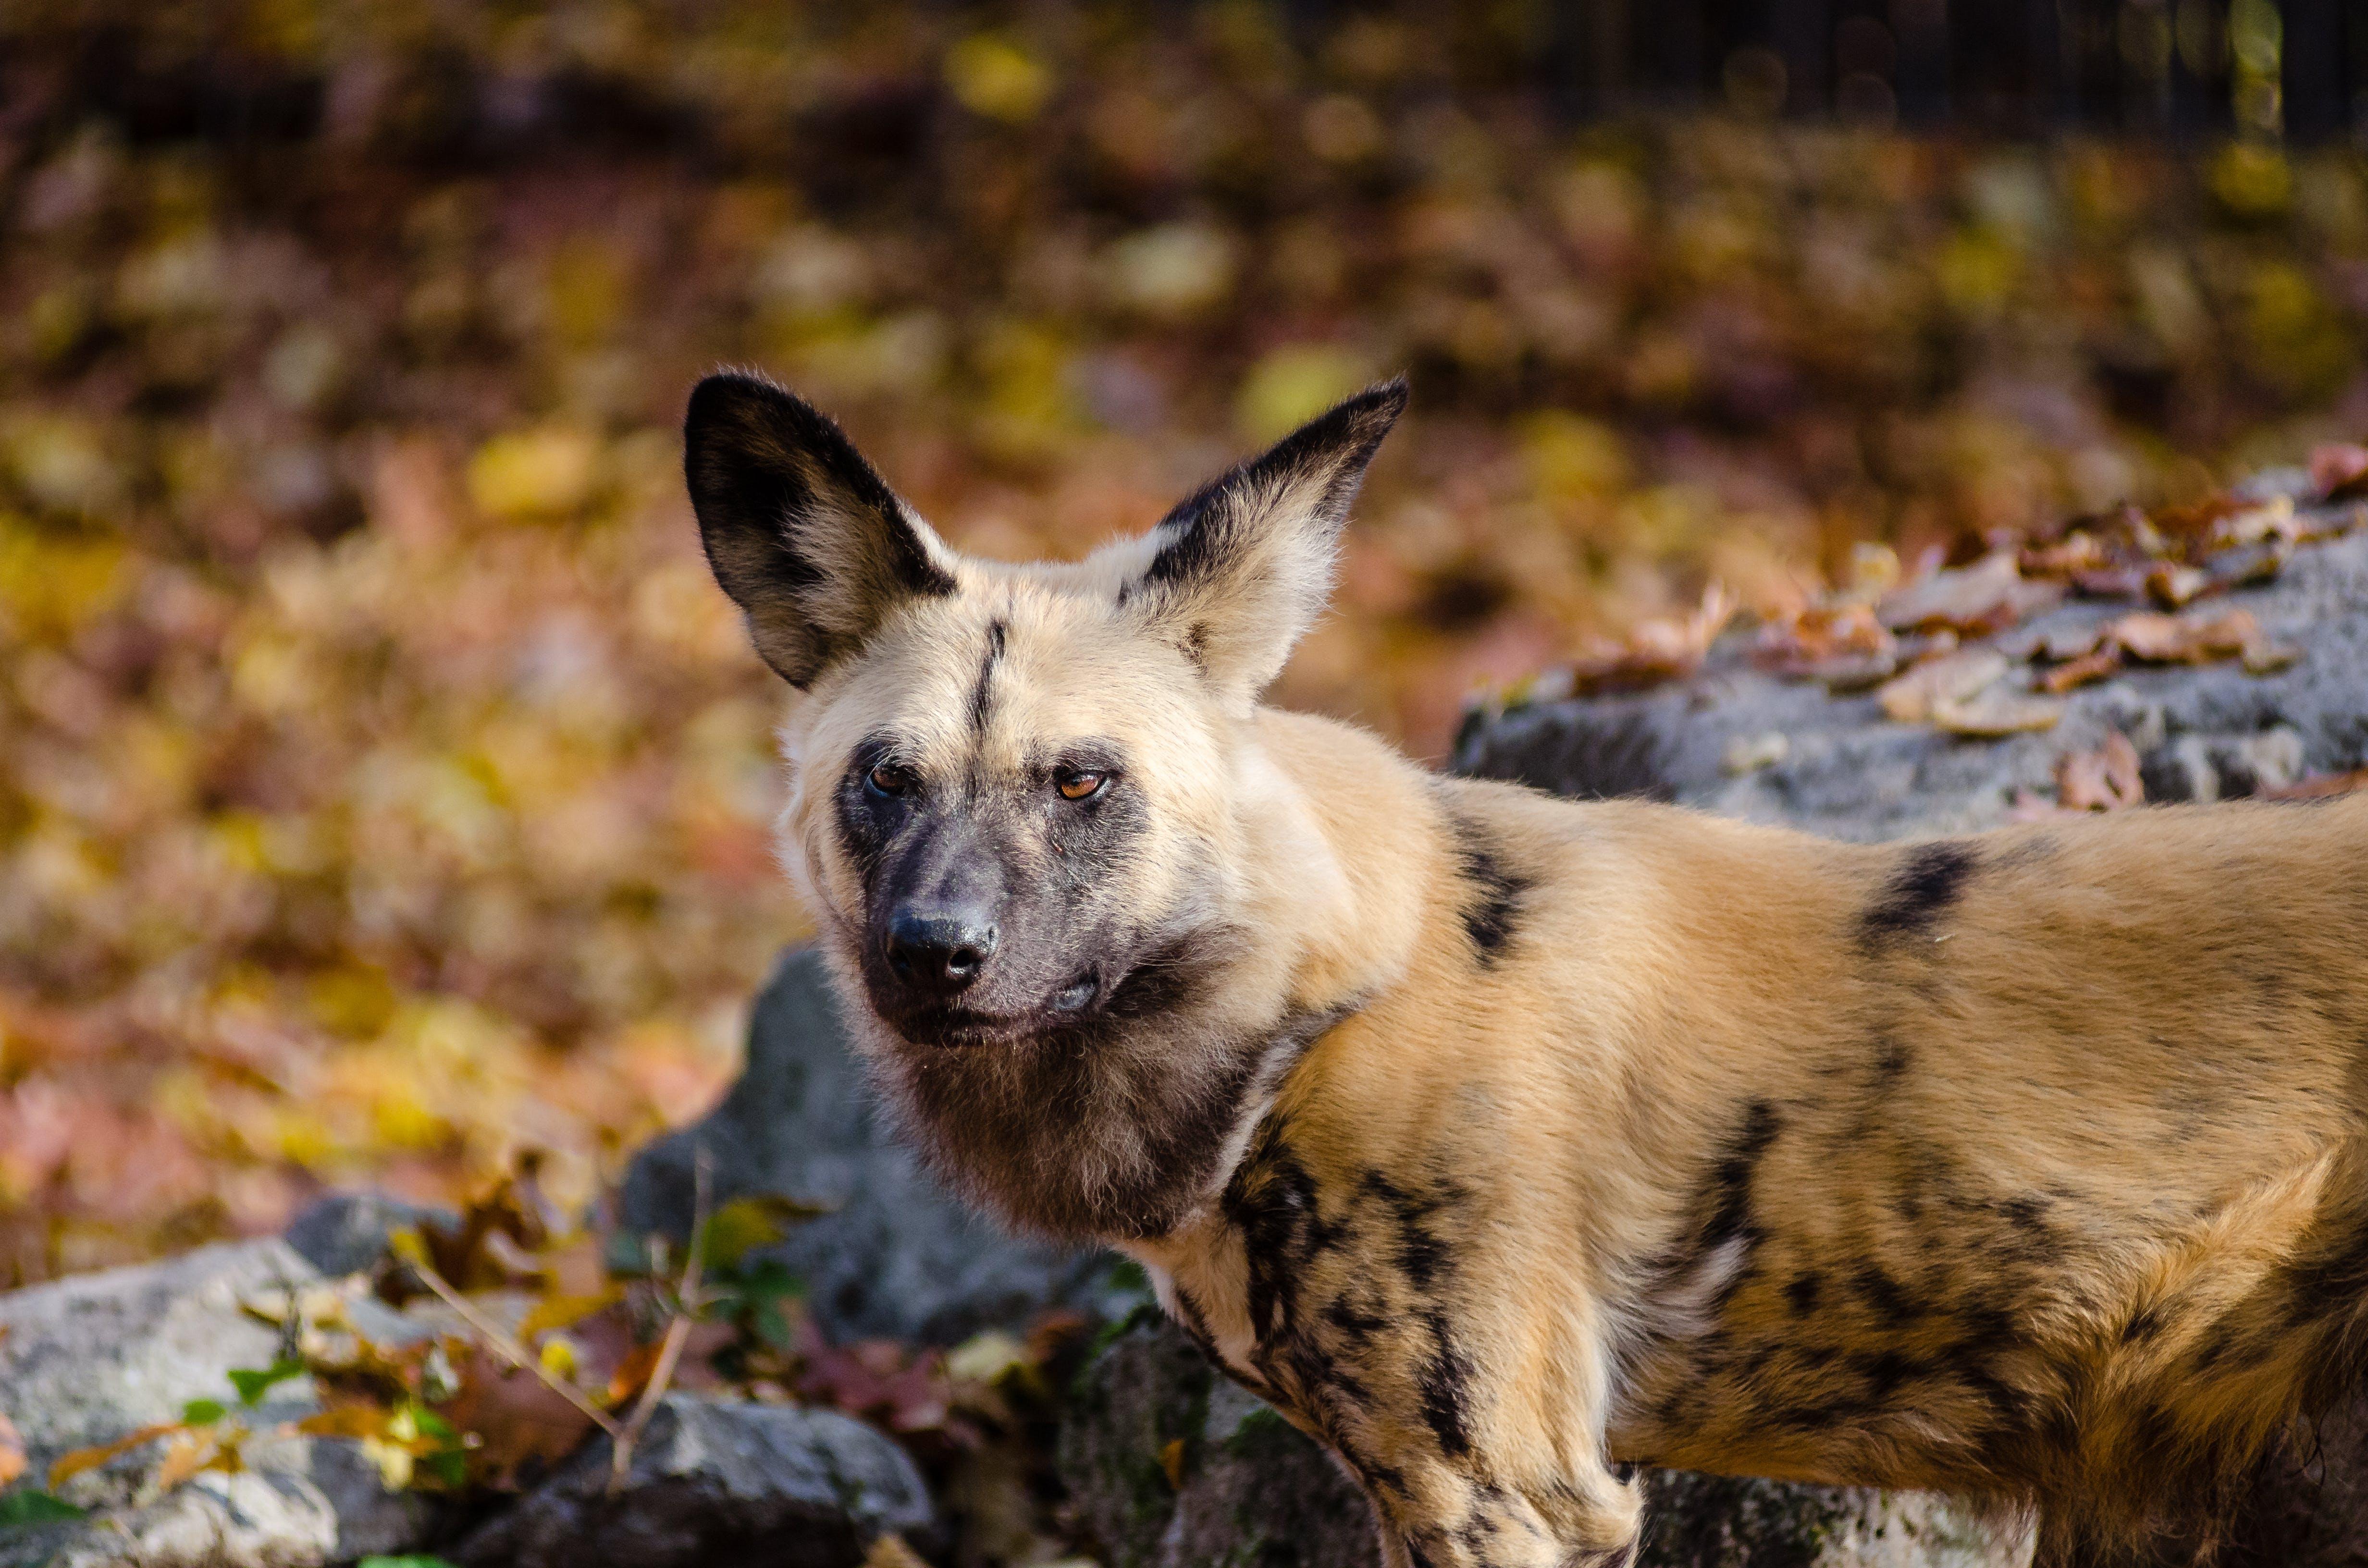 Brown and Black Long Coat Animal Near Grey Rock